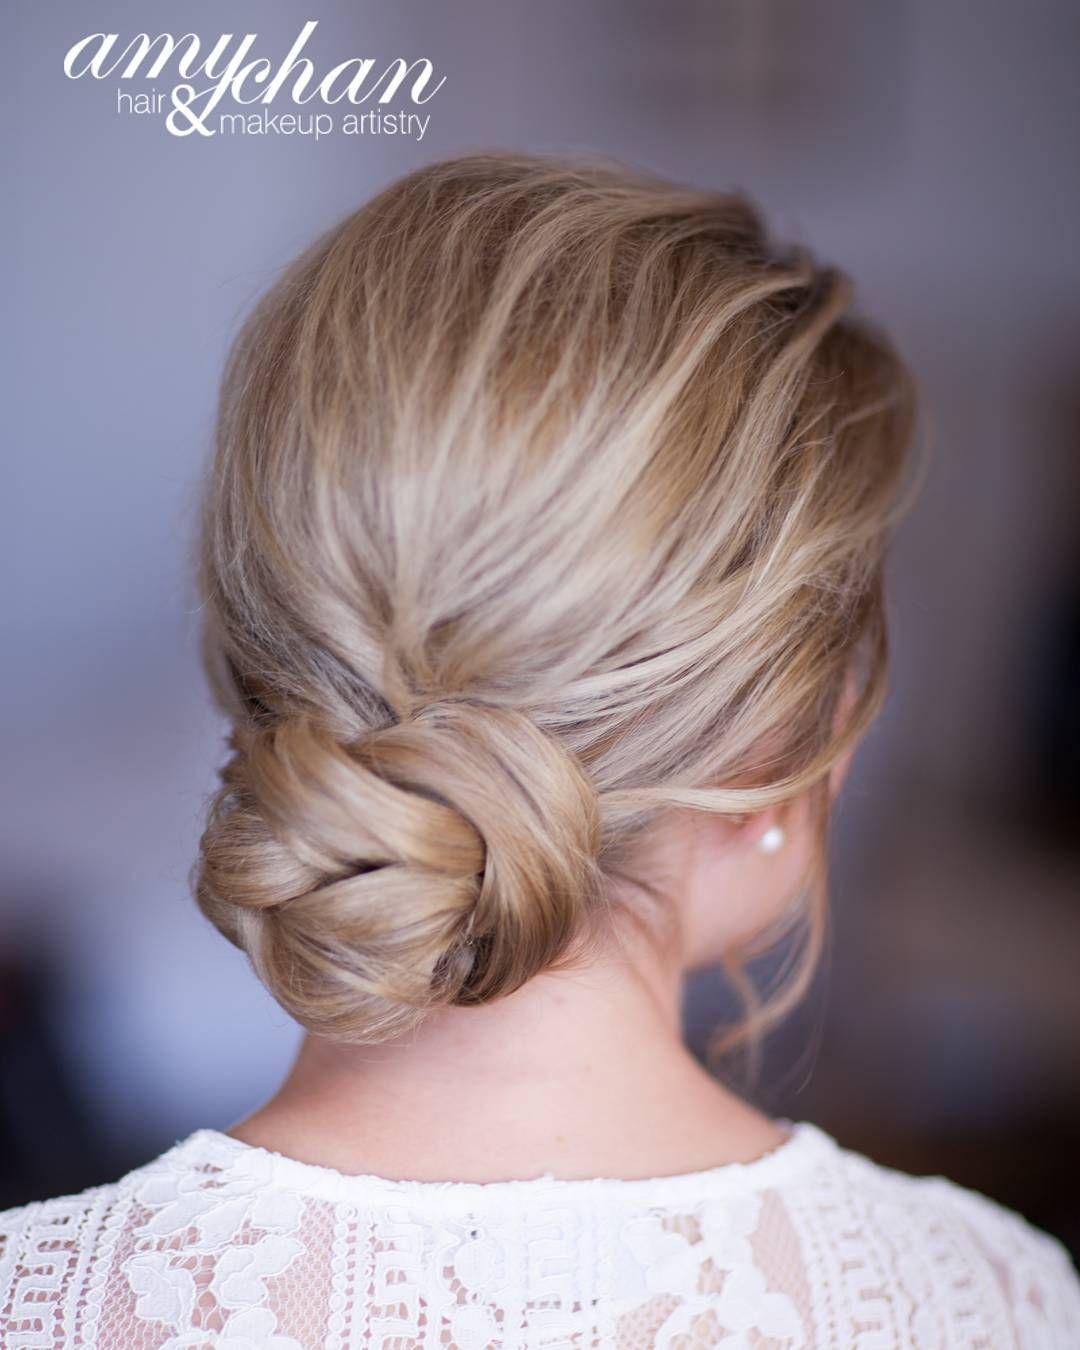 sydney wedding hair & makeup (@amychanhairmakeup